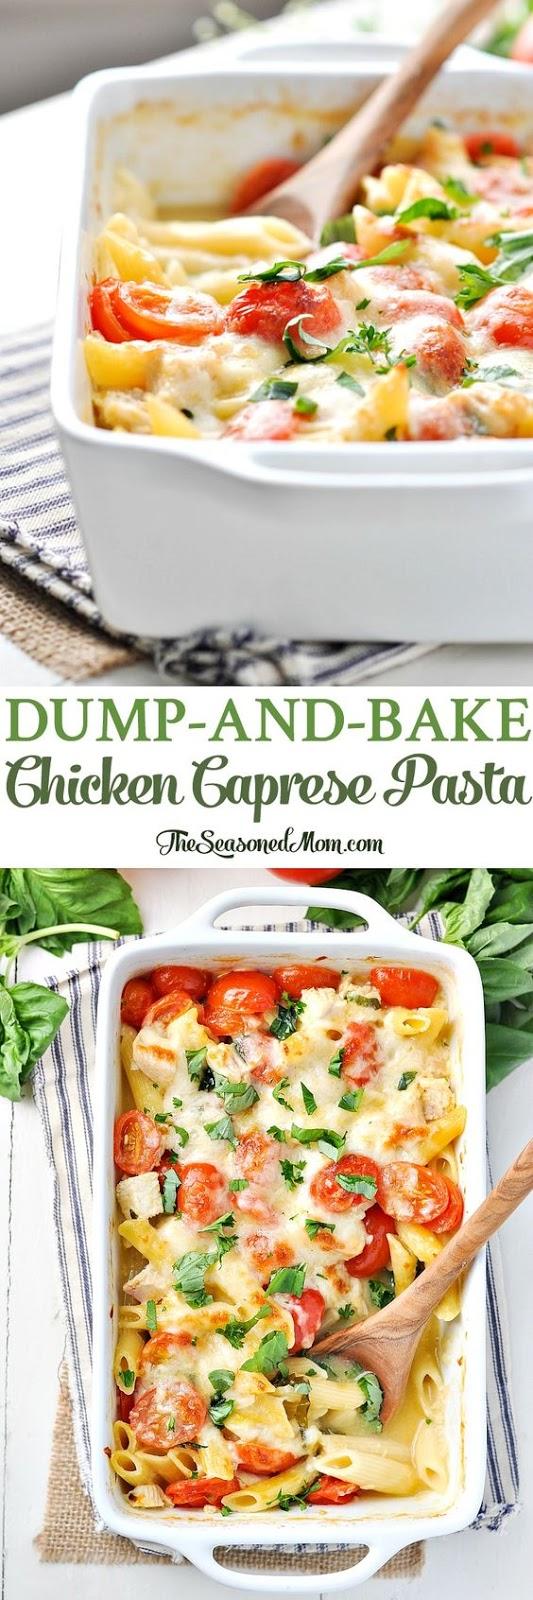 DUMP-AND-BAKE CHICKEN CAPRESE PASTA